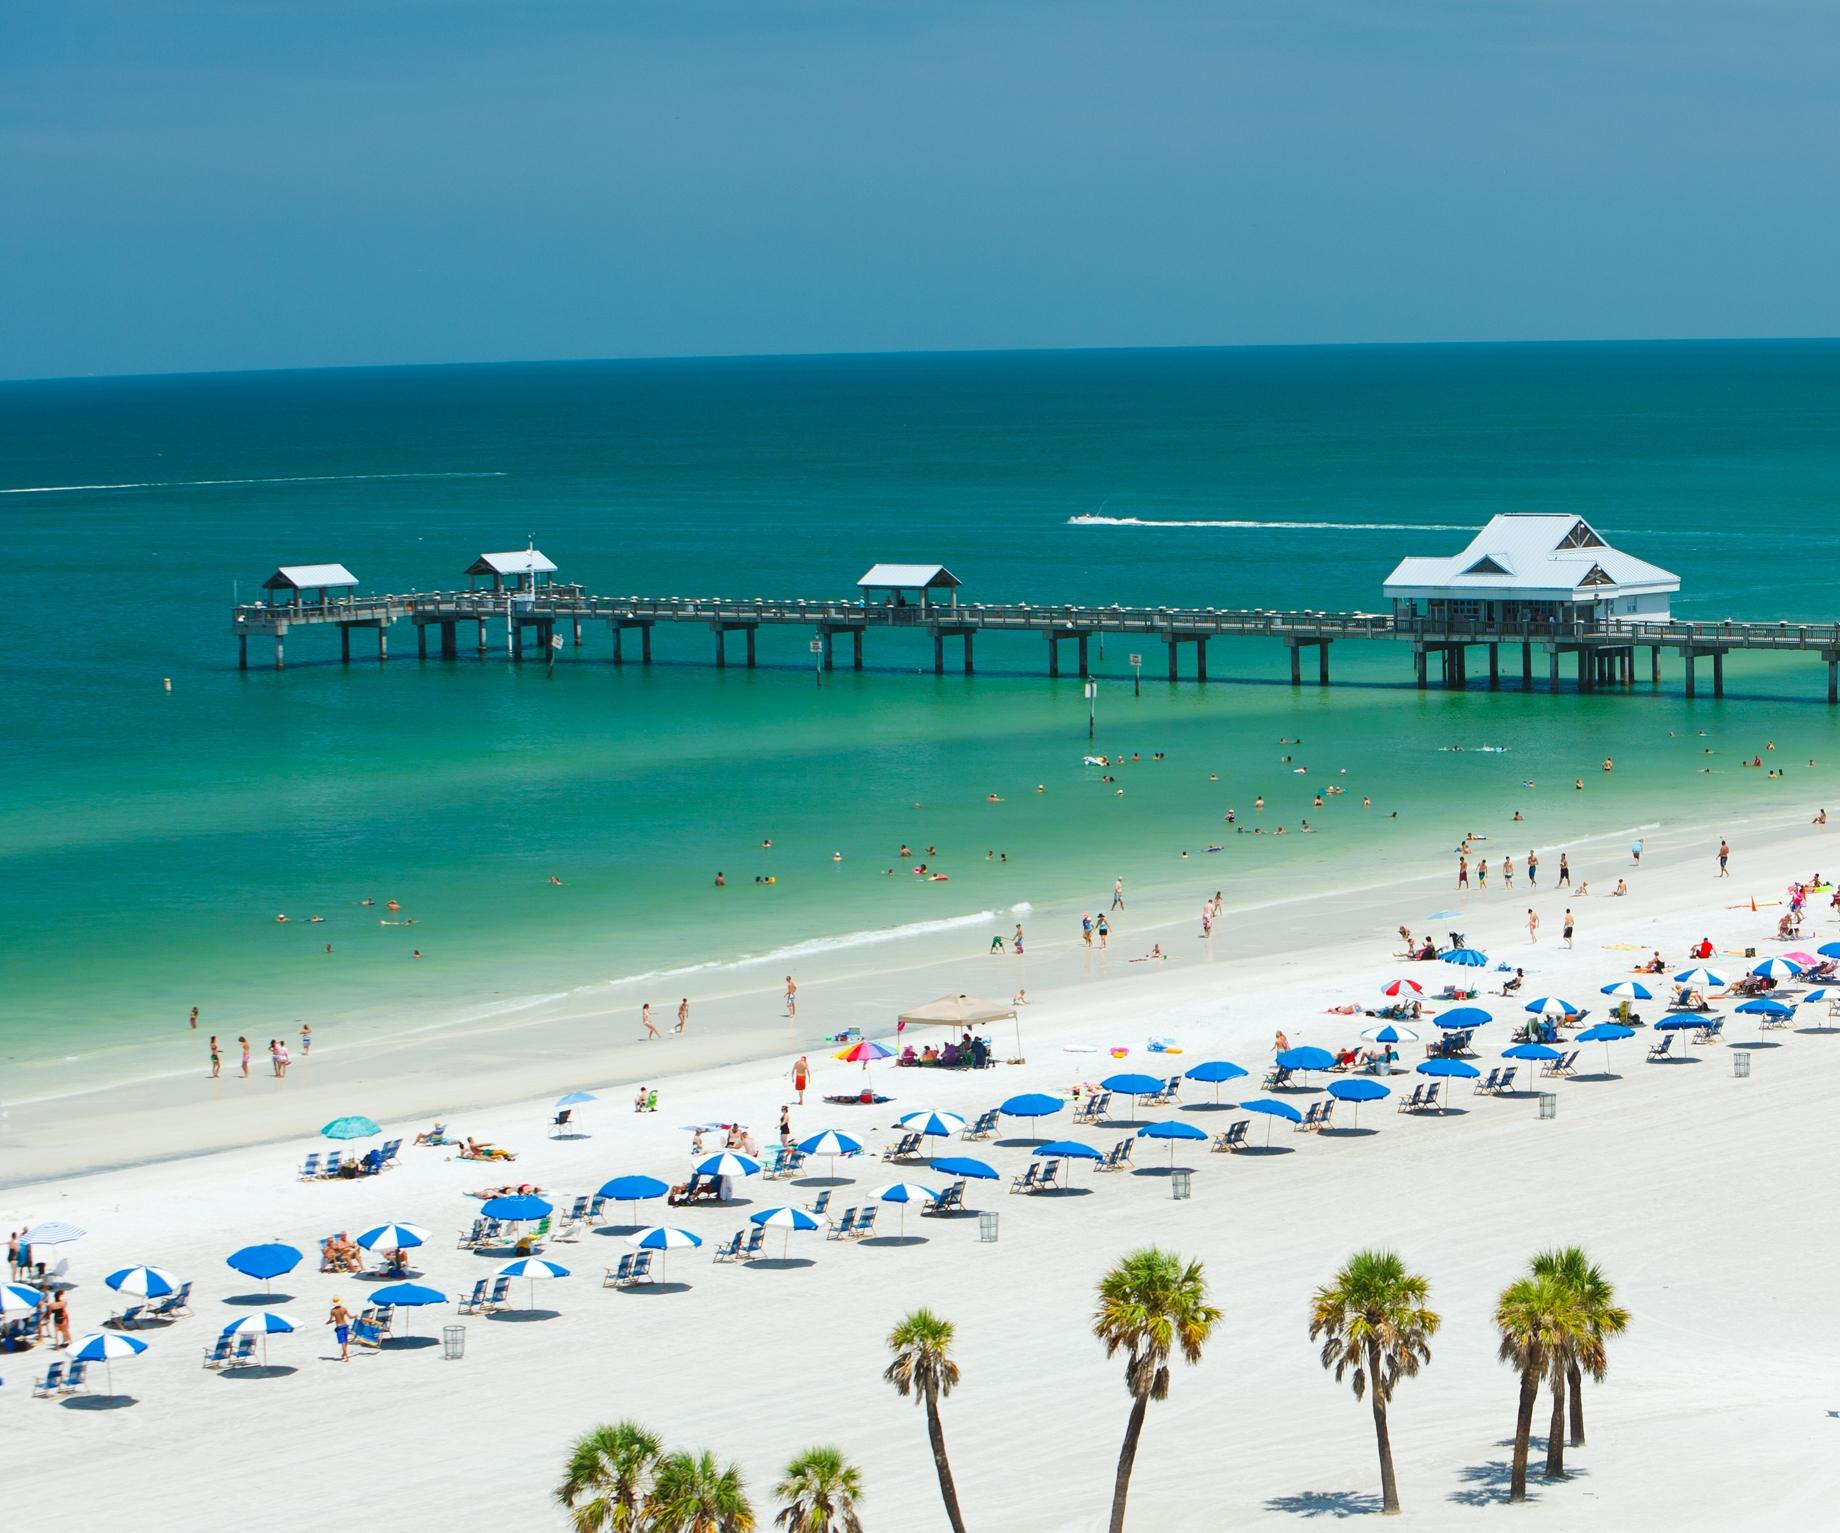 Praia de Clearwater, cidade que combina atividades junto a natureza com eventos e festivais